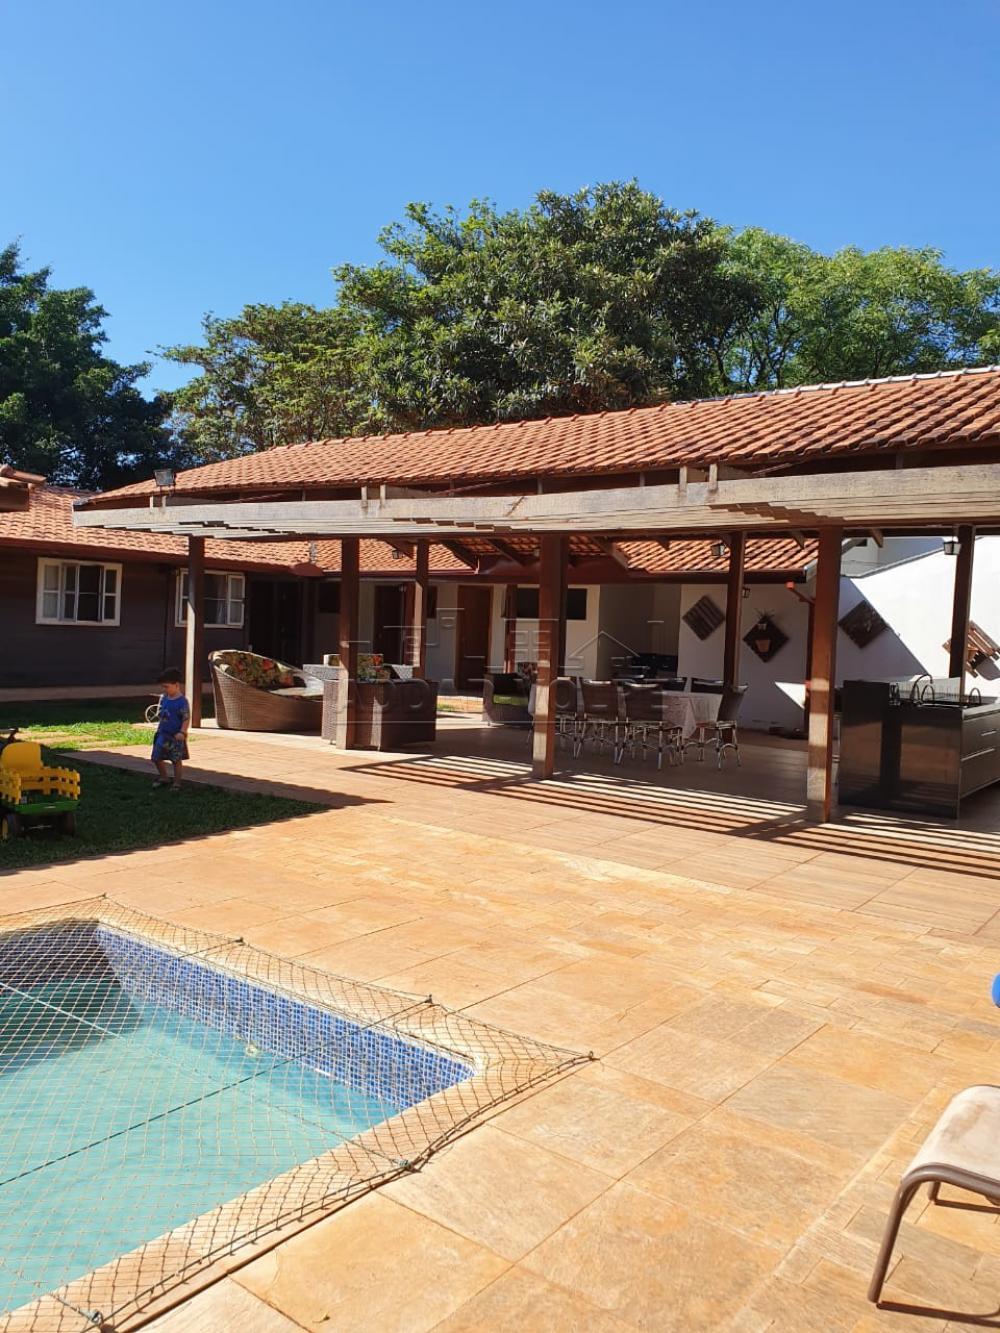 Comprar Casa / Condomínio em Bauru apenas R$ 2.700.000,00 - Foto 17